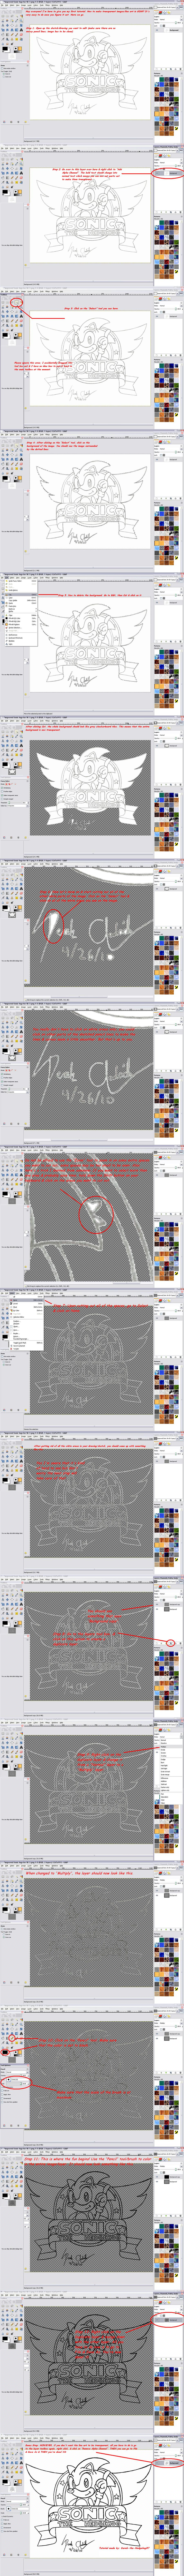 How to make line art in GIMP by FirebirdPhoenix87